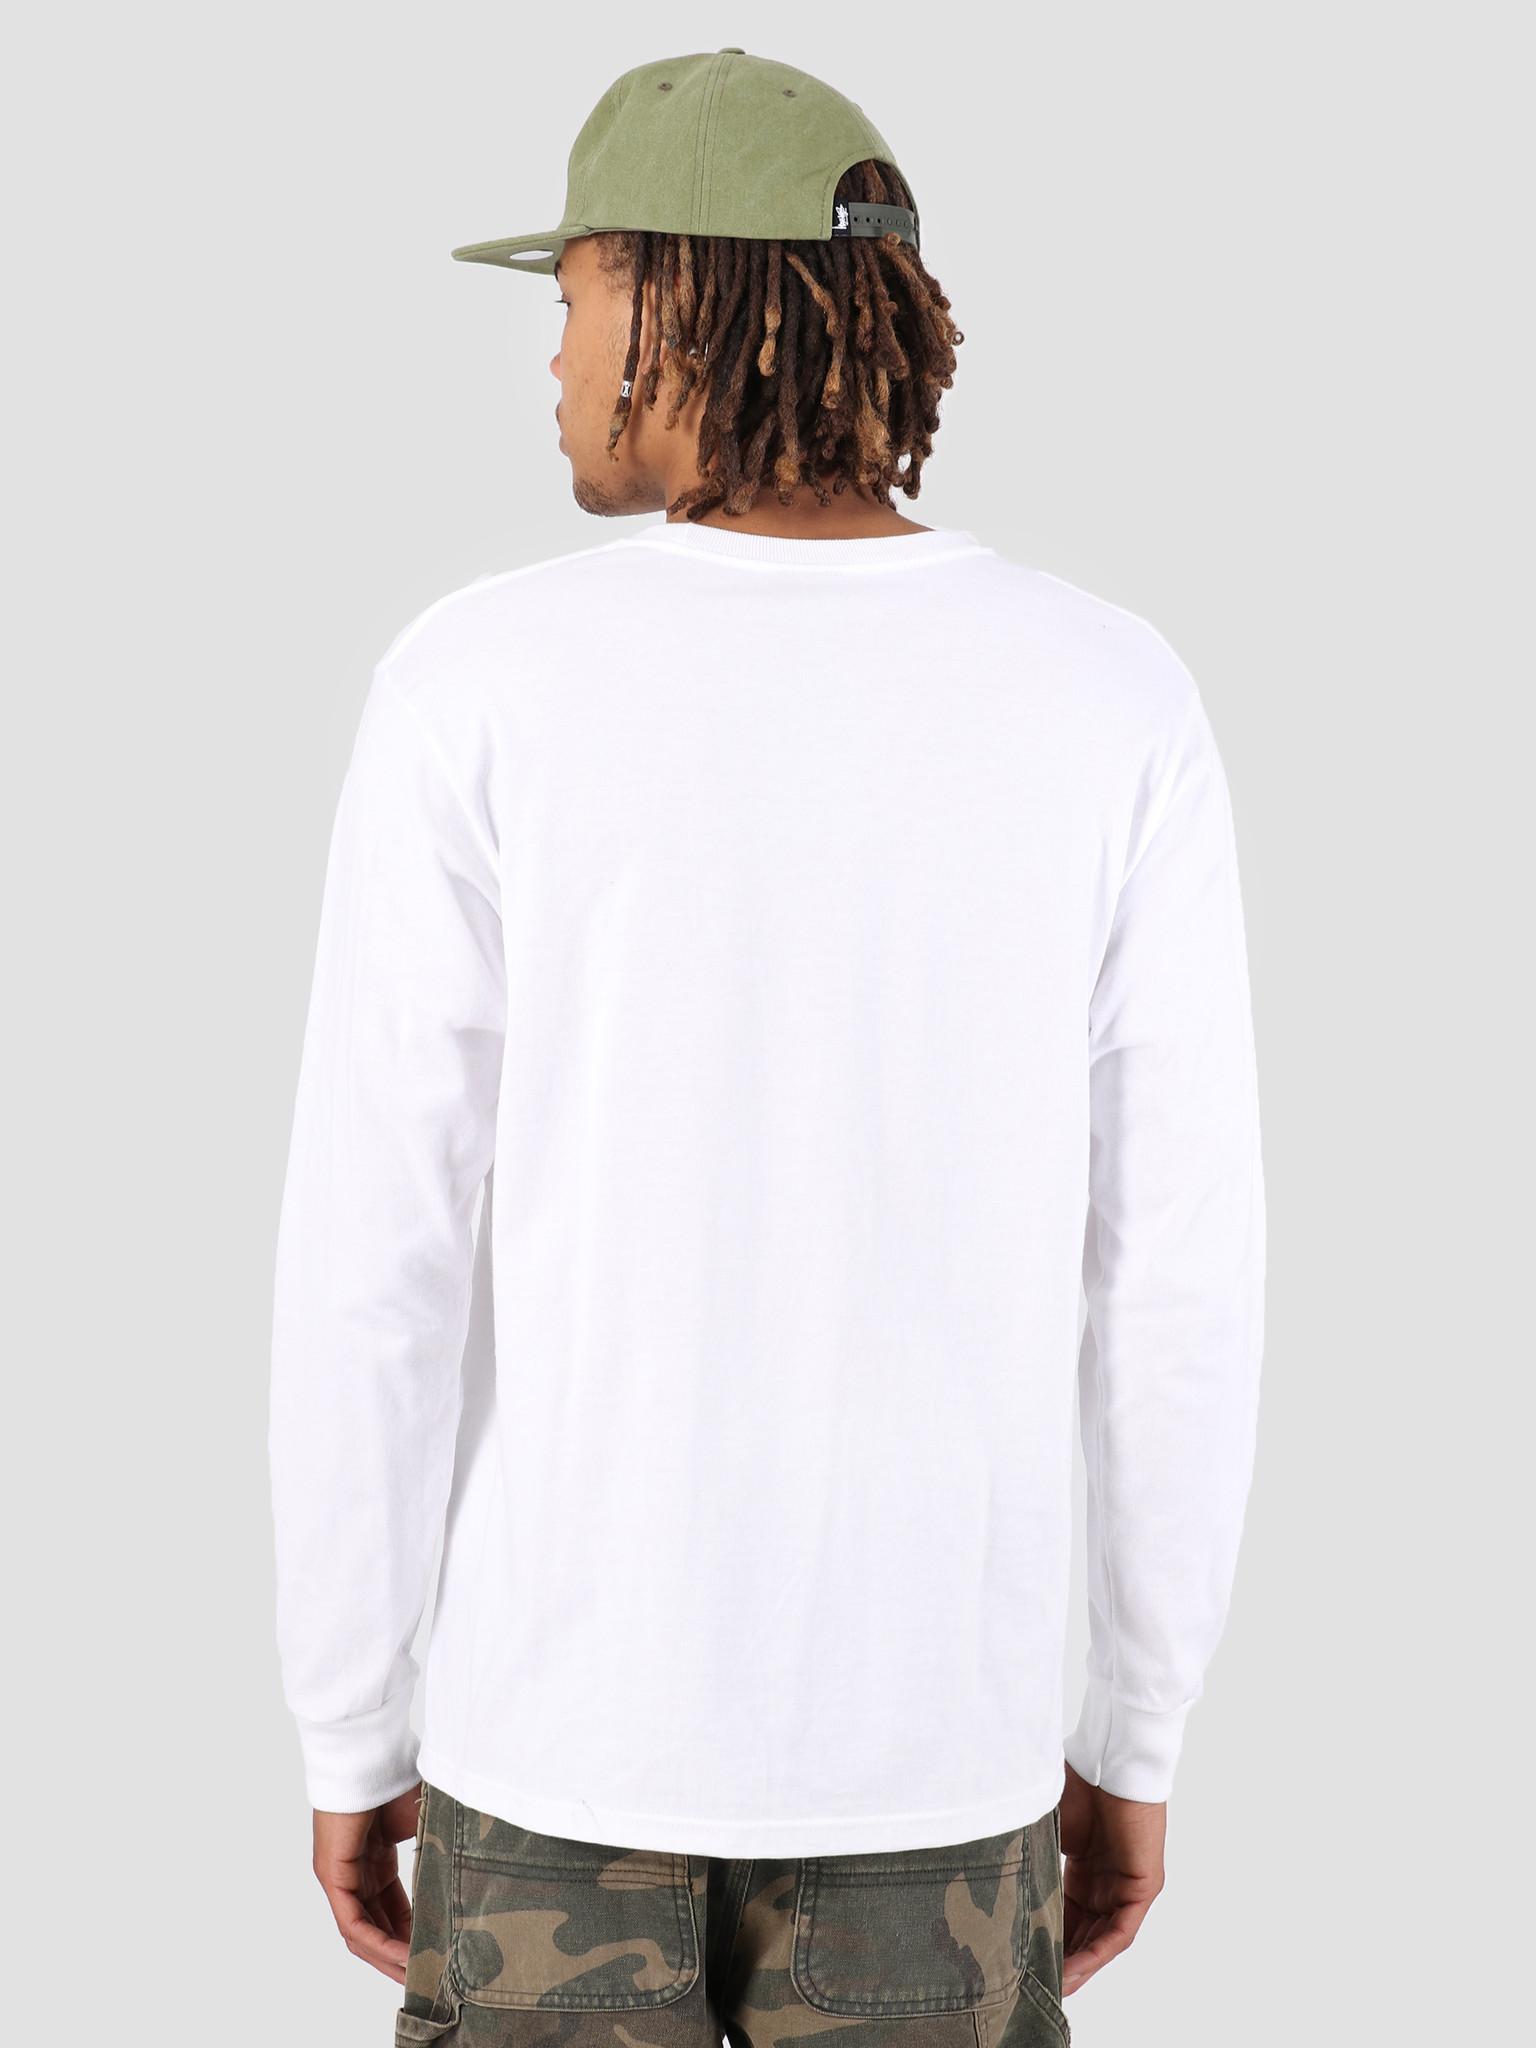 Stussy Stussy Stock Longsleeve T-Shirt White 1201